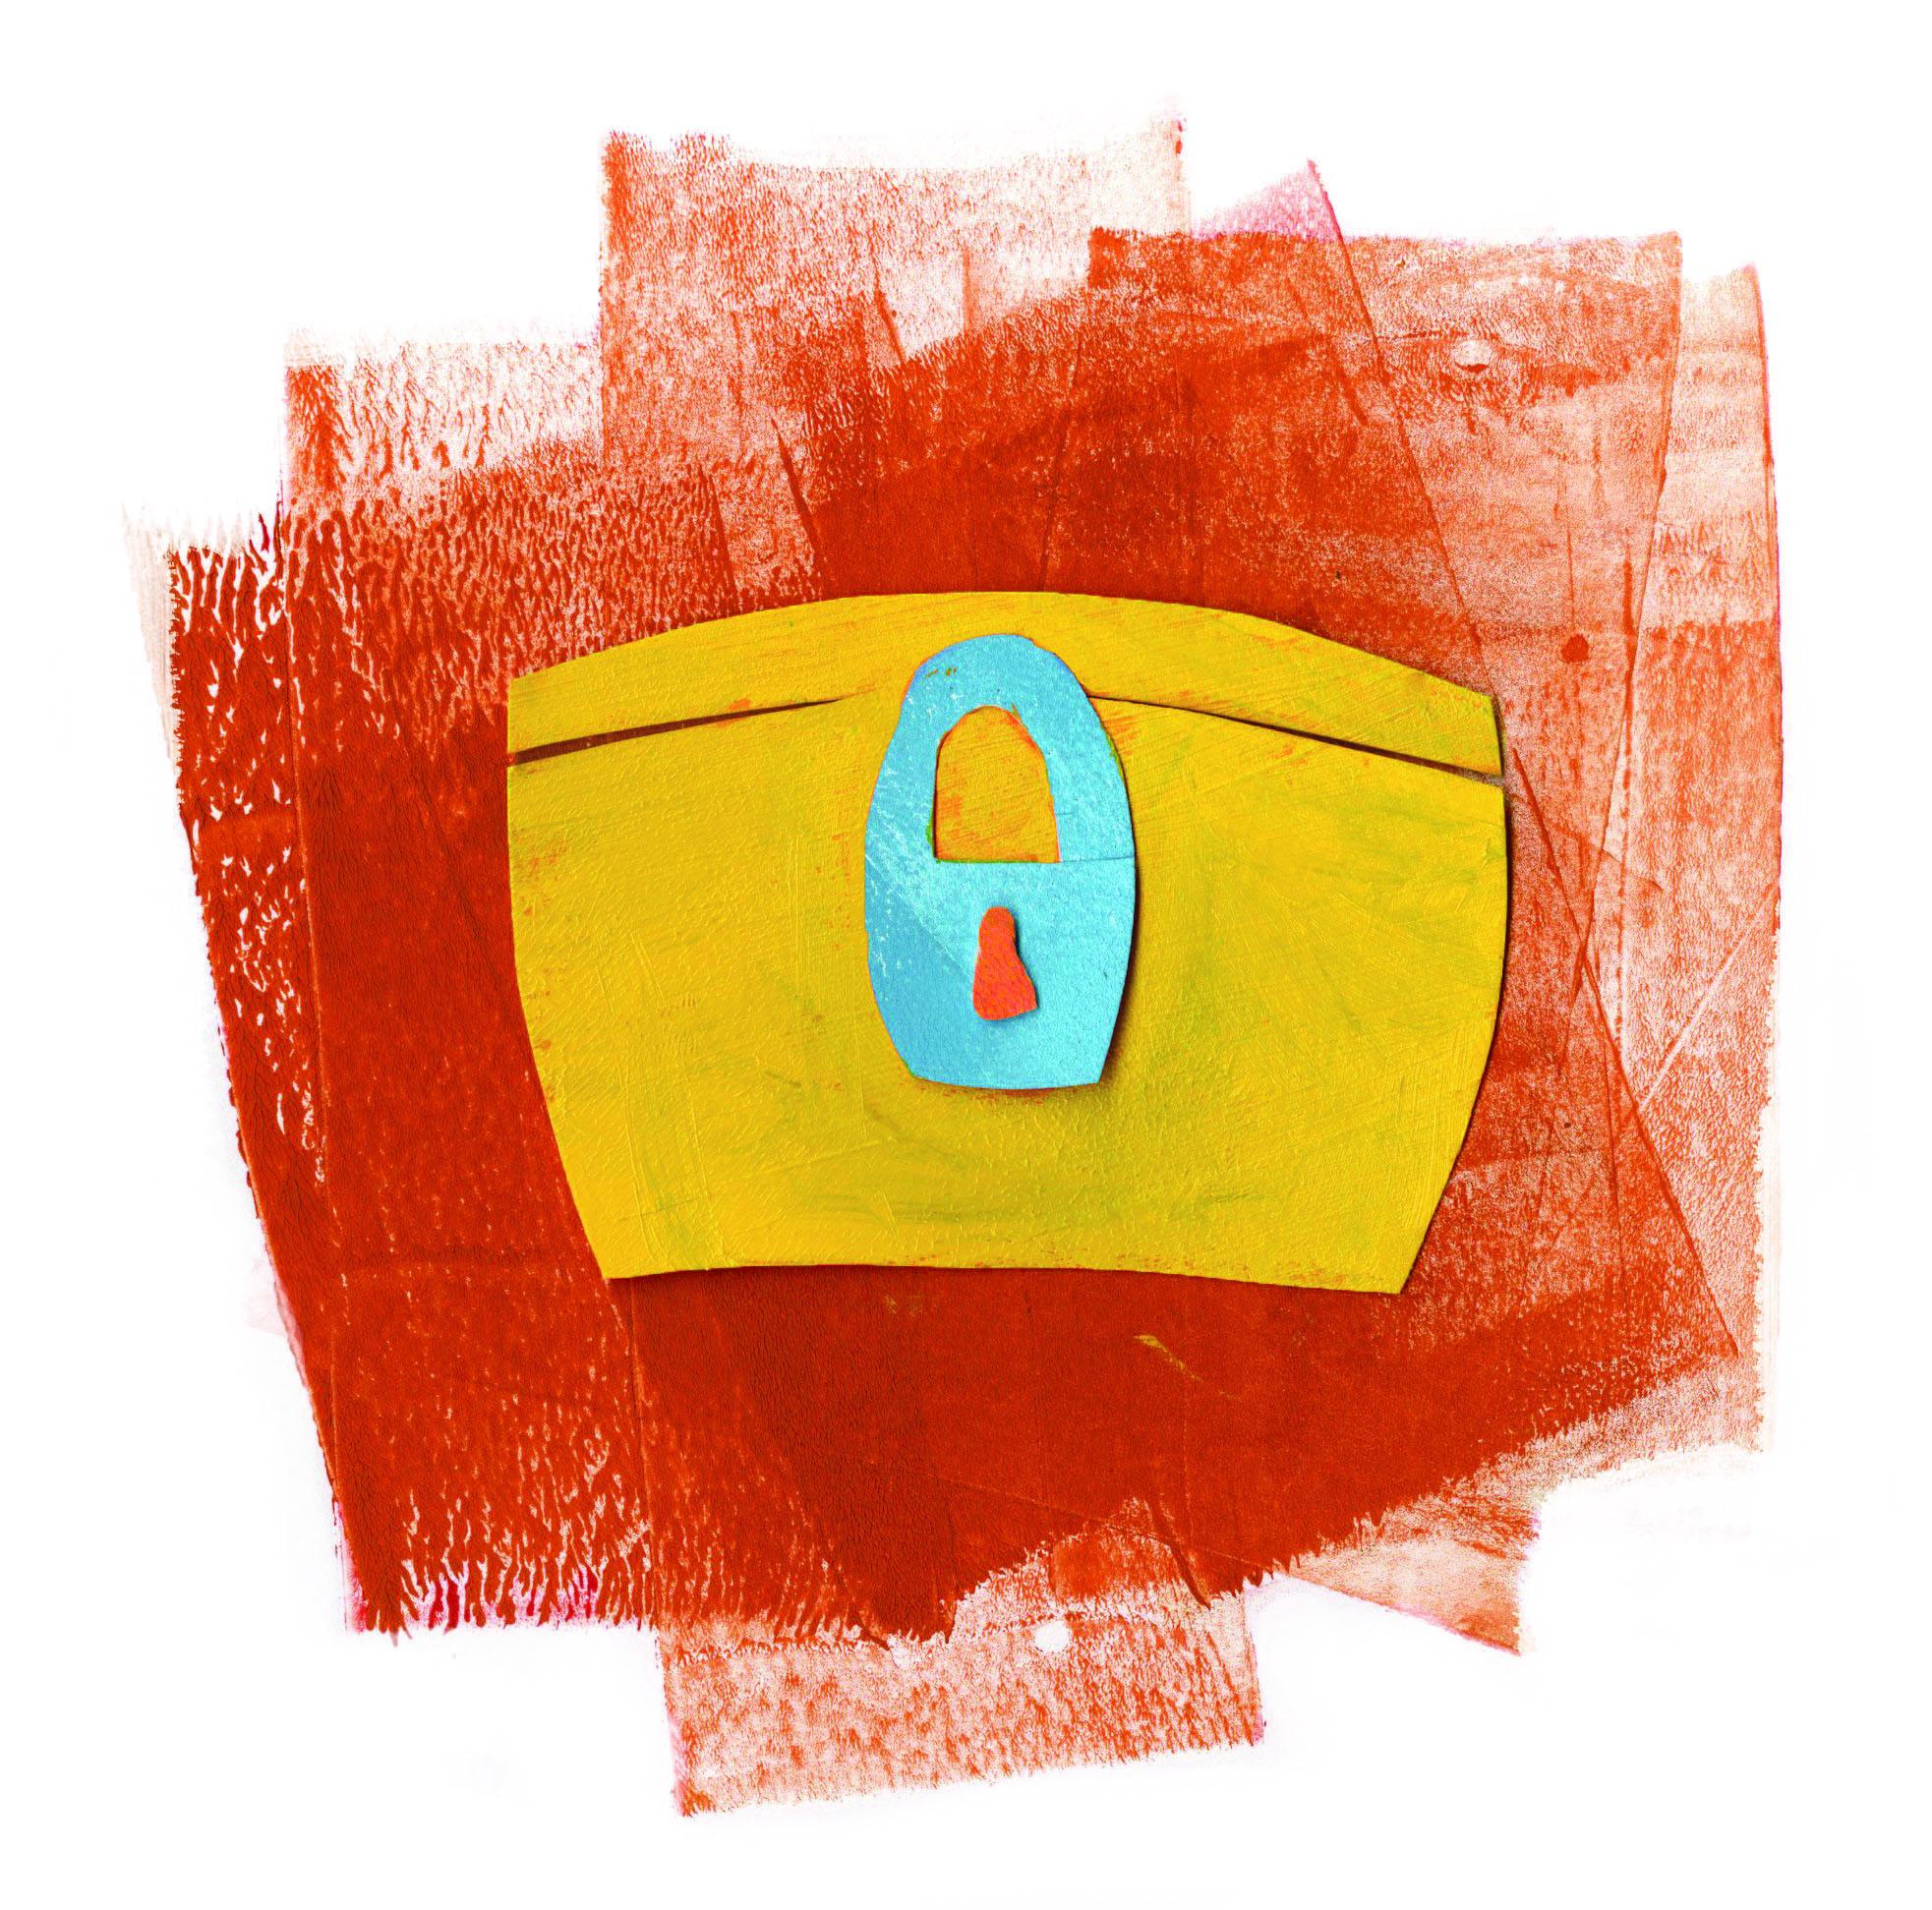 Microfinance Icon